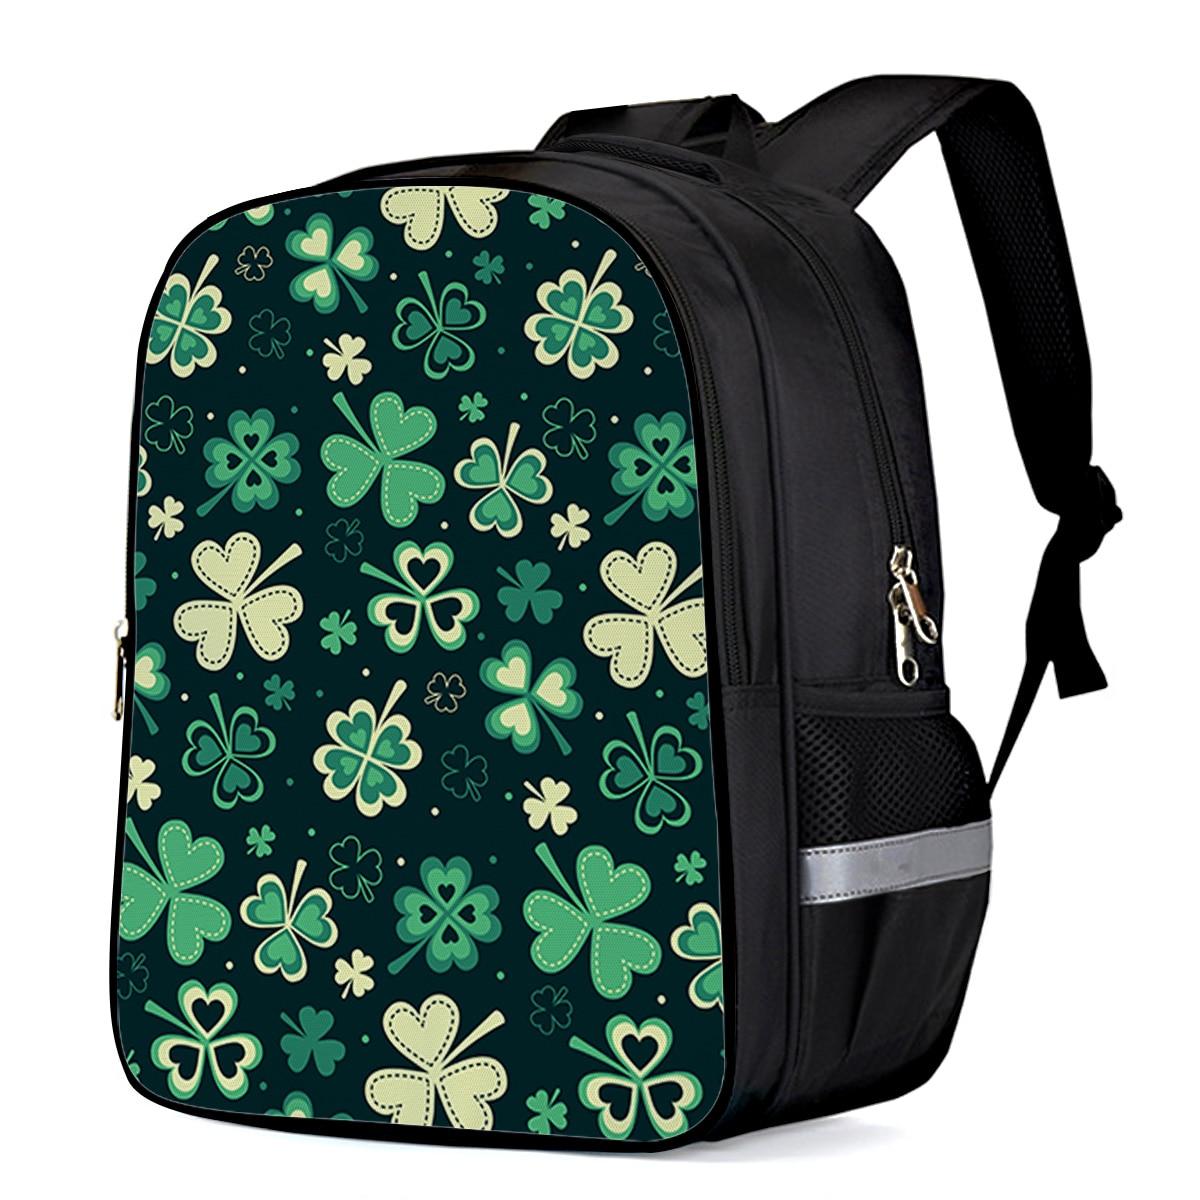 St. Patrick'S Day Clover Laptop Backpacks School Bag Child Book Bag Sports Bags Bottle Side Pockets School Student